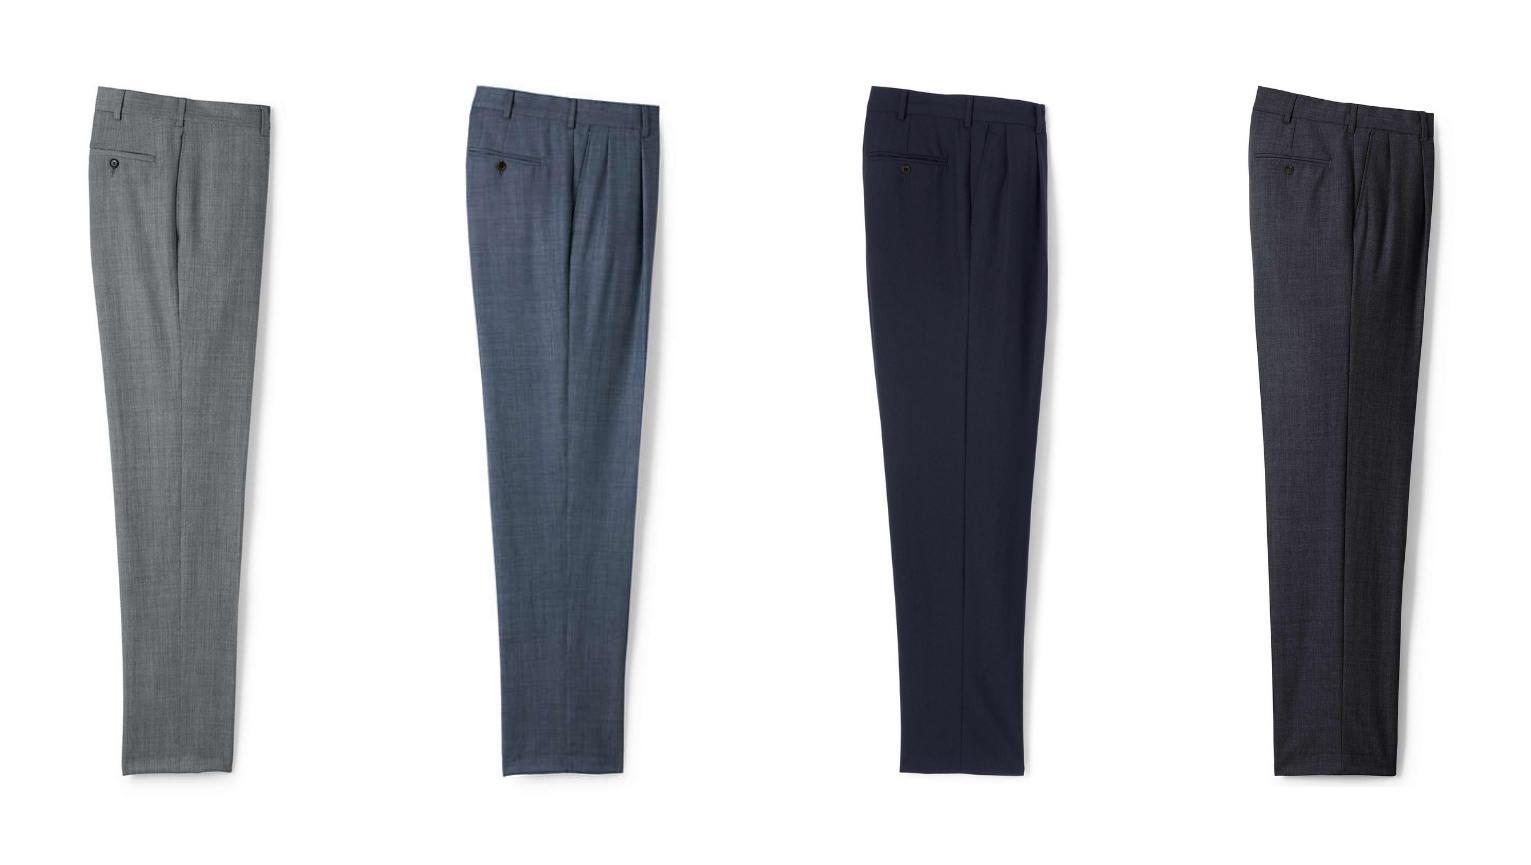 Minimalist dress pants collection